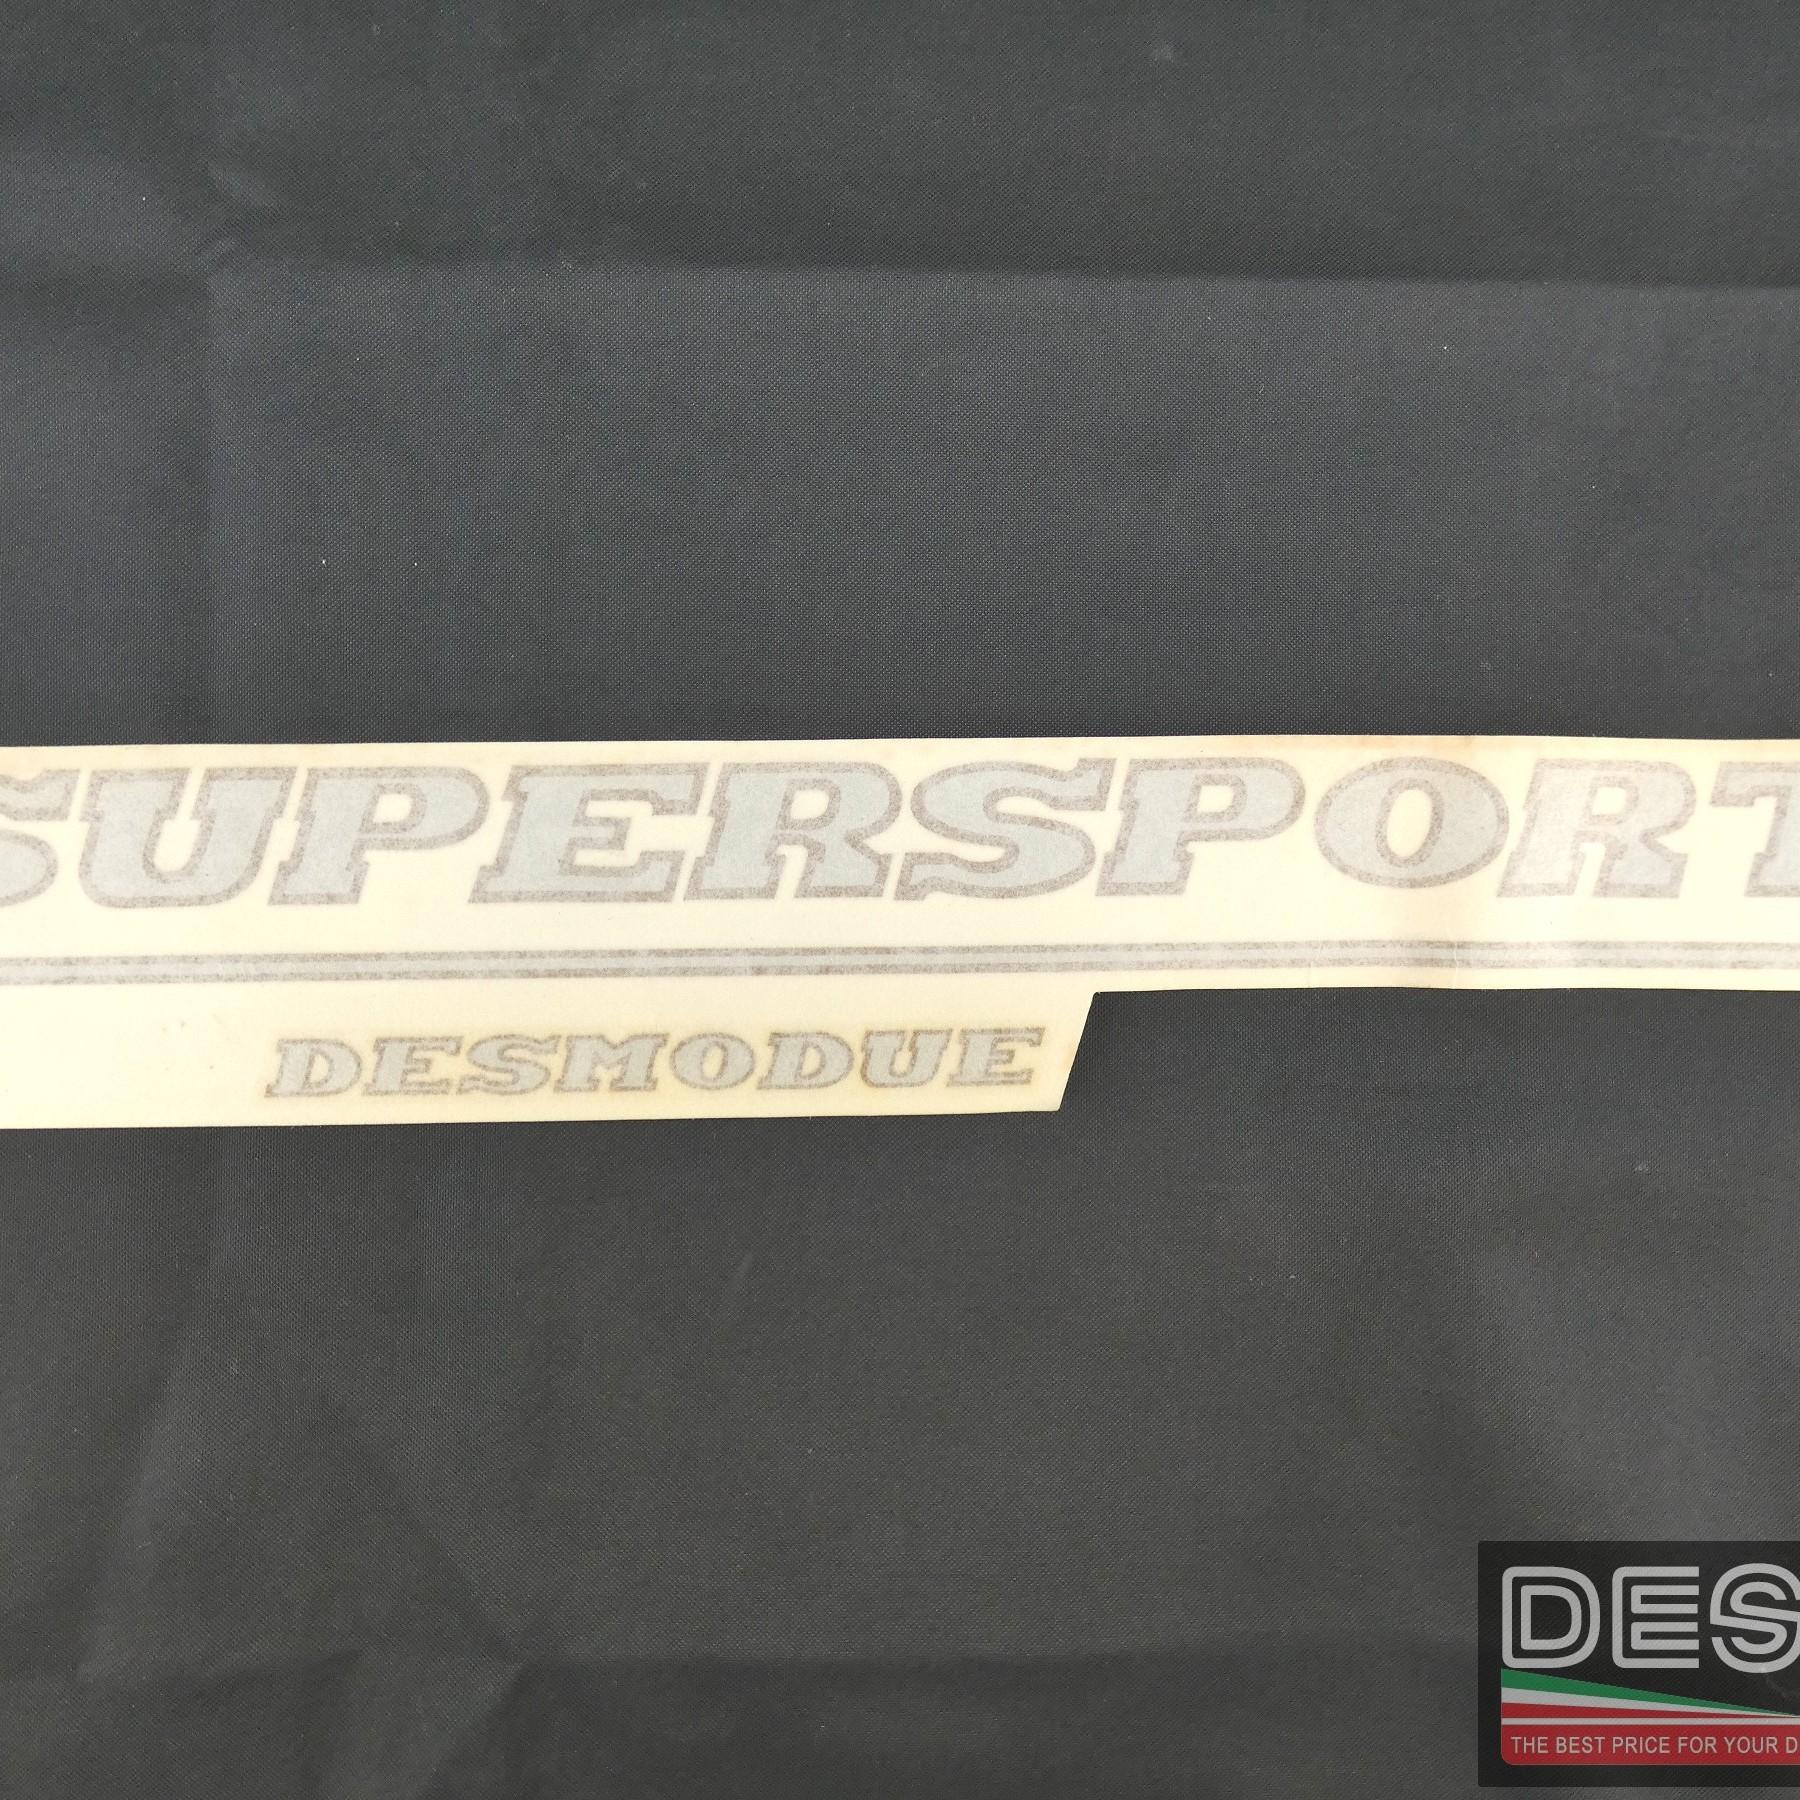 Adesivo decal carena fiancata sinistra Ducati Supersport